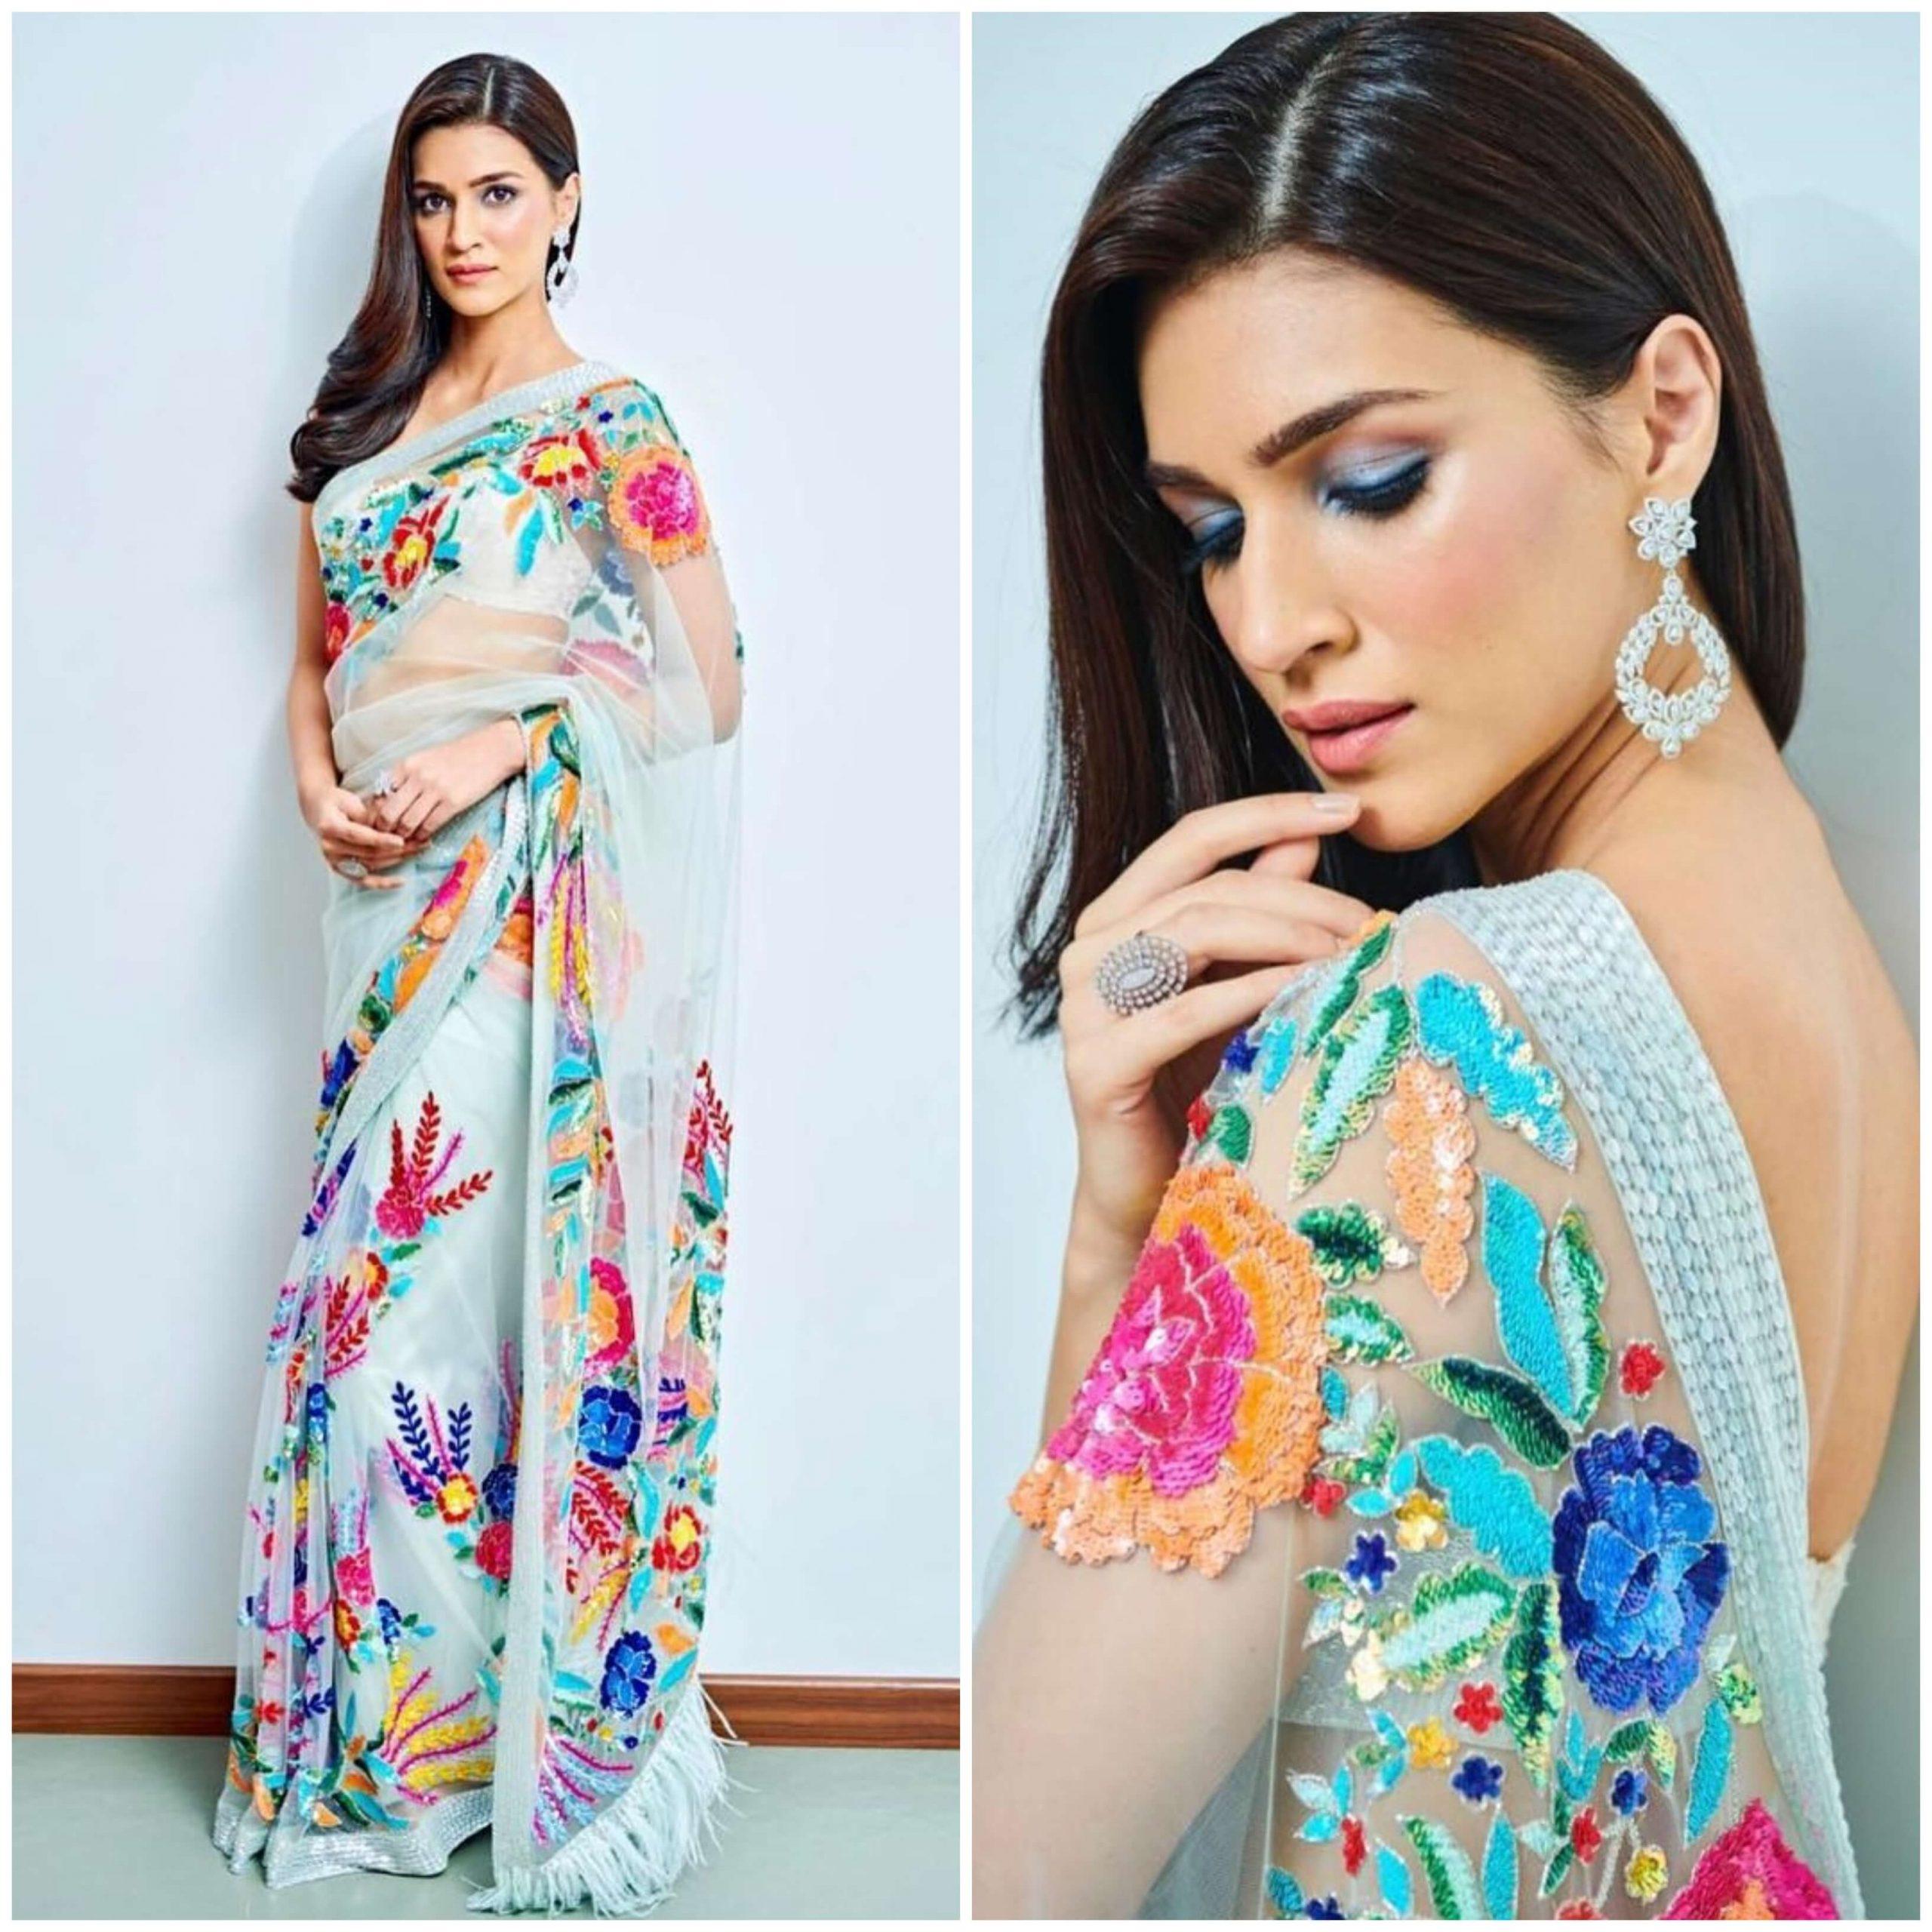 Kriti Sanon Beautiful Floral Print Designer Dress